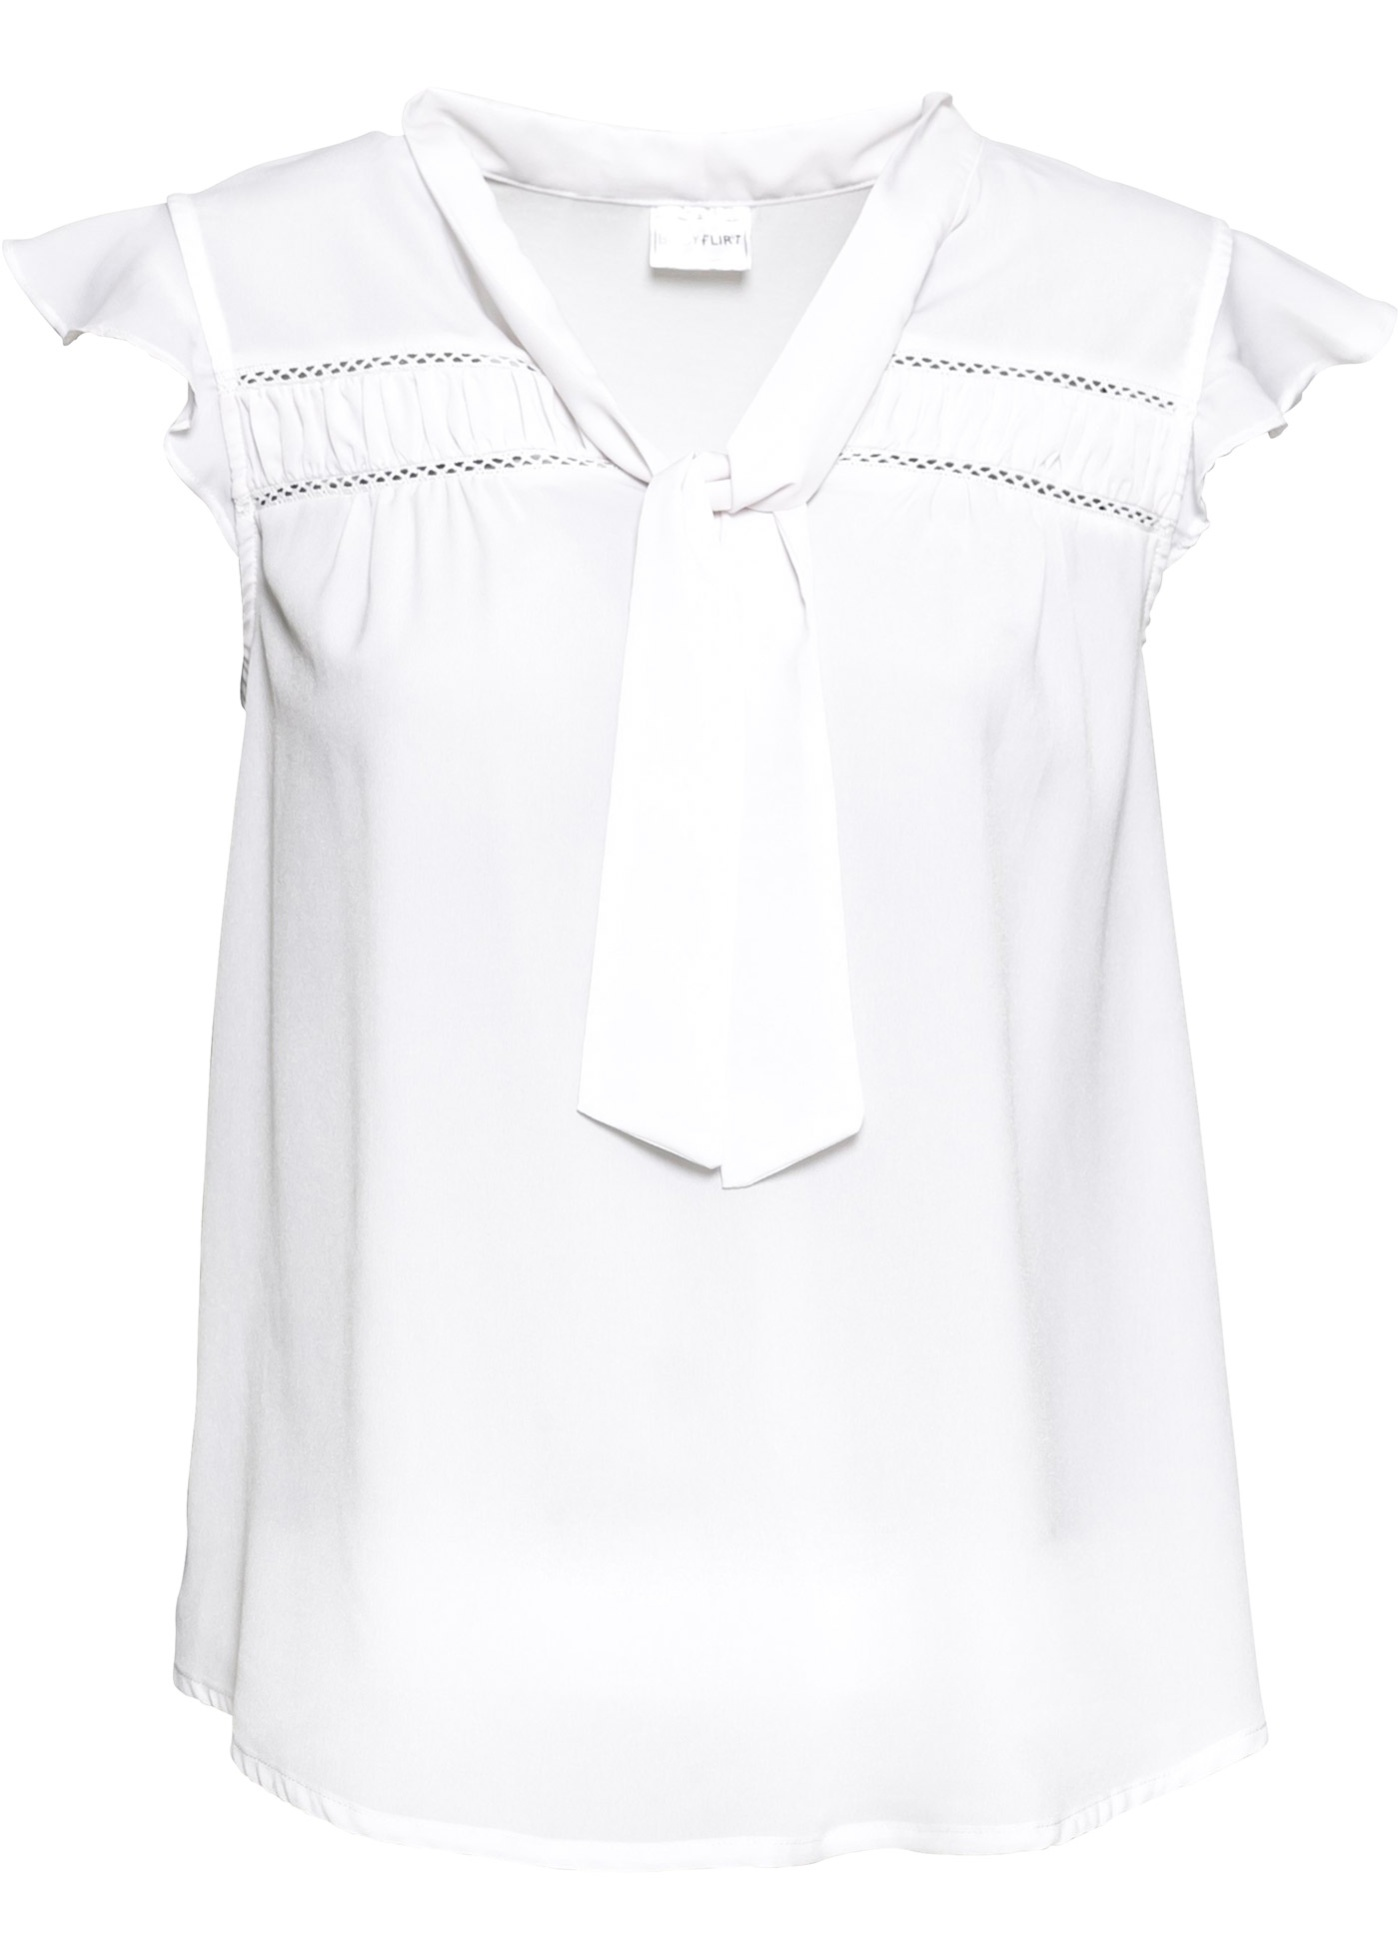 Pour Bodyflirt Blouse Mancherons Femme shirt Blanc BonprixT OPZuTXik